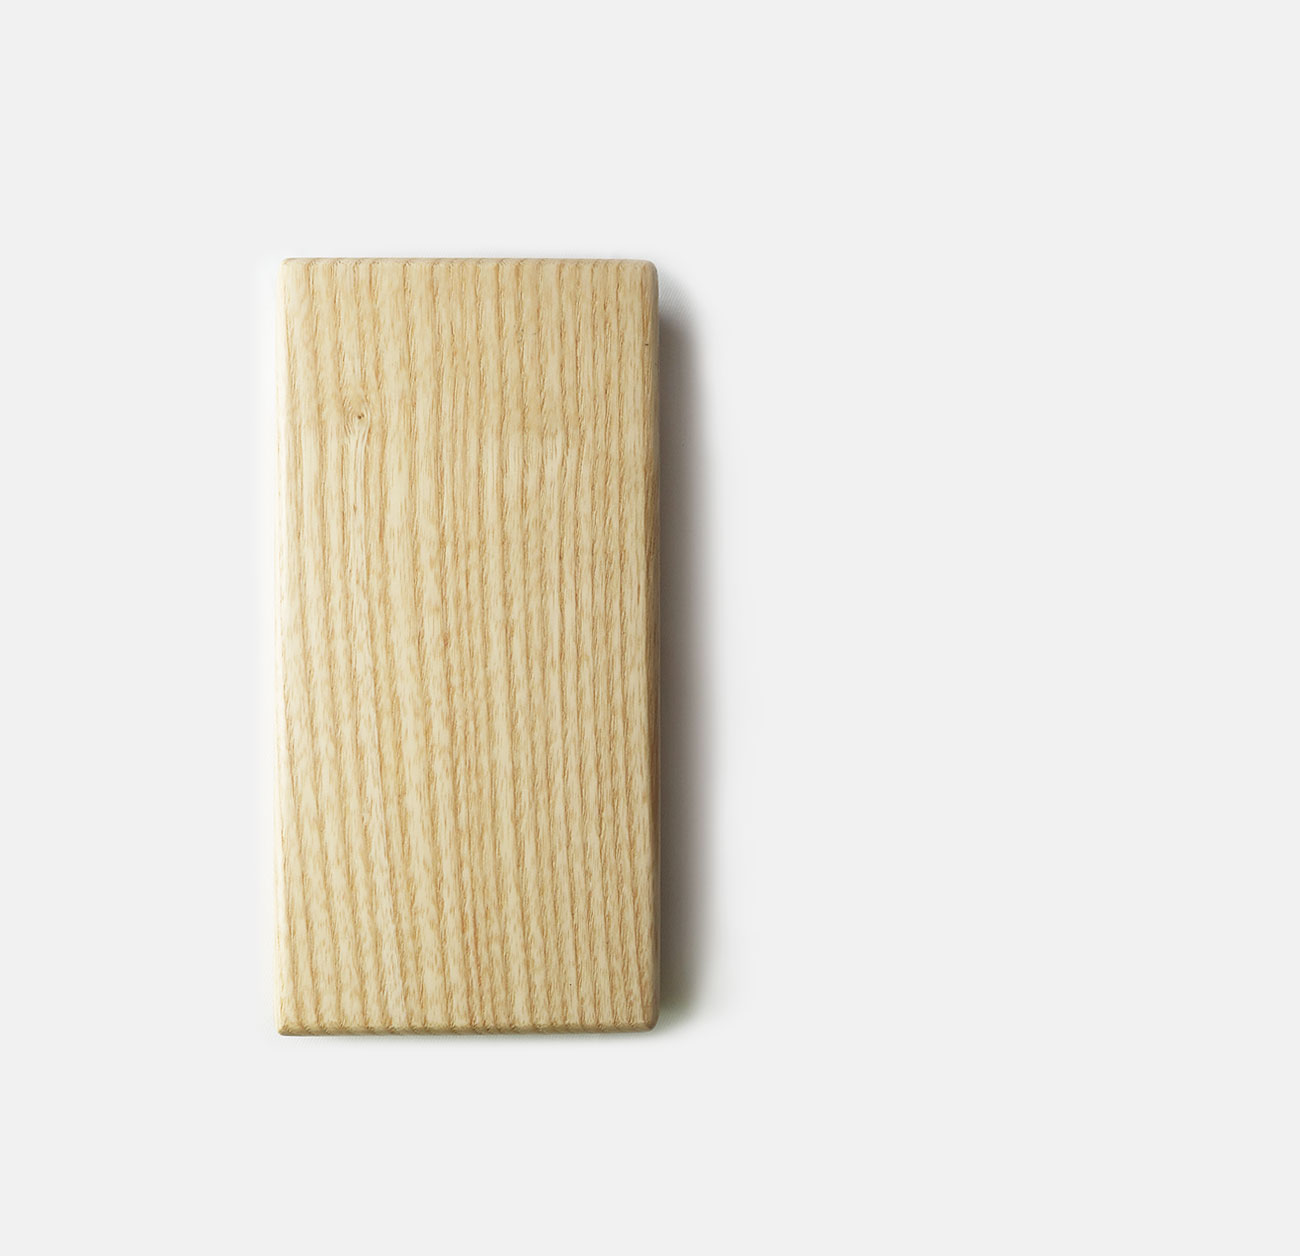 ash-wood-block